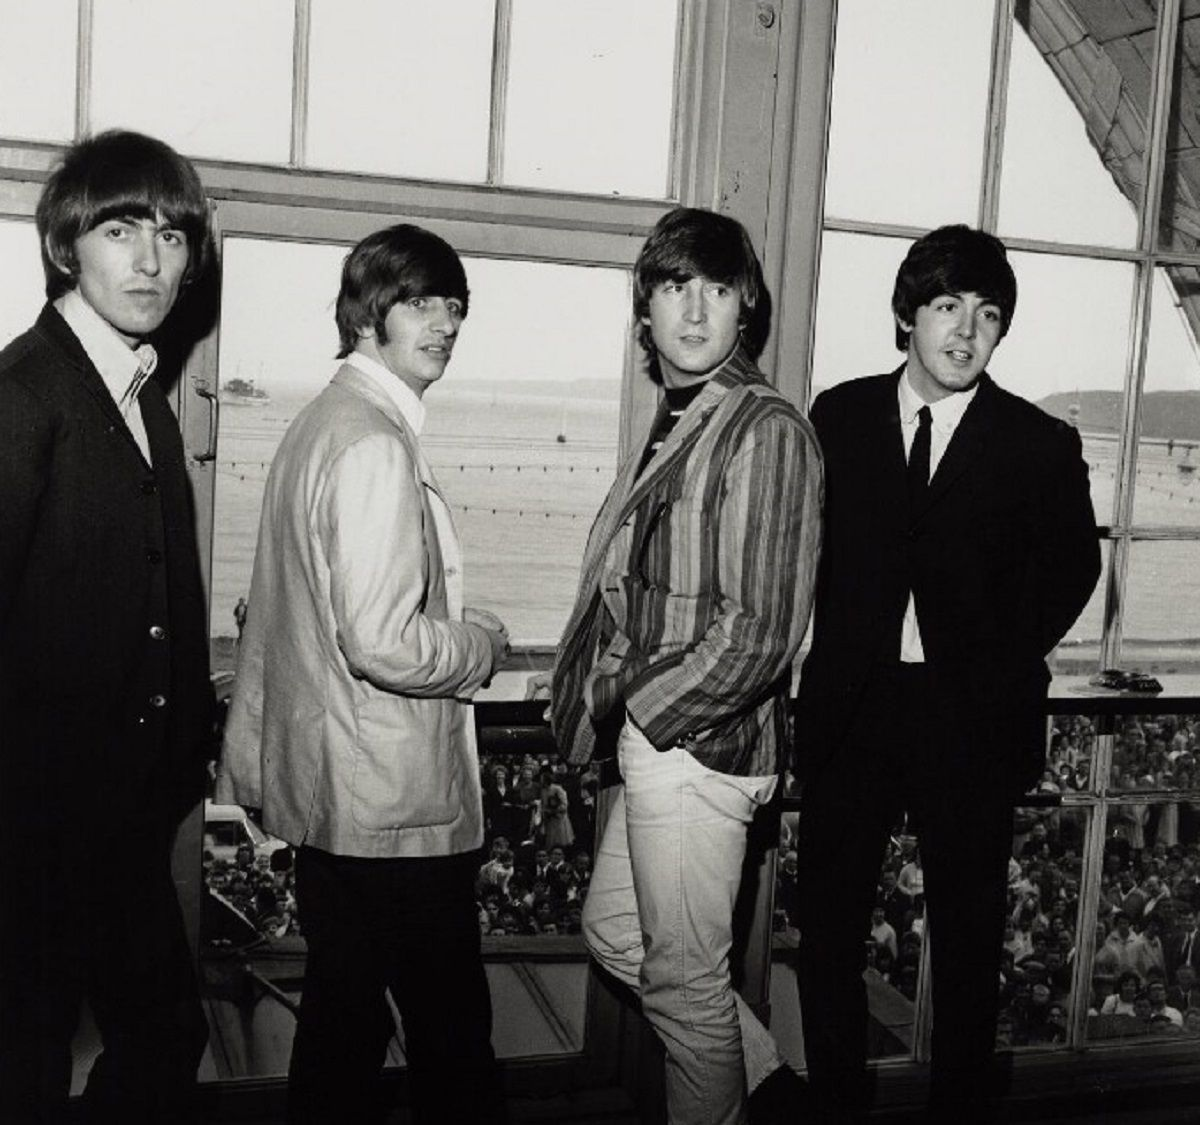 Paul McCartney y Ringo Starr harán un cover de John Lennon